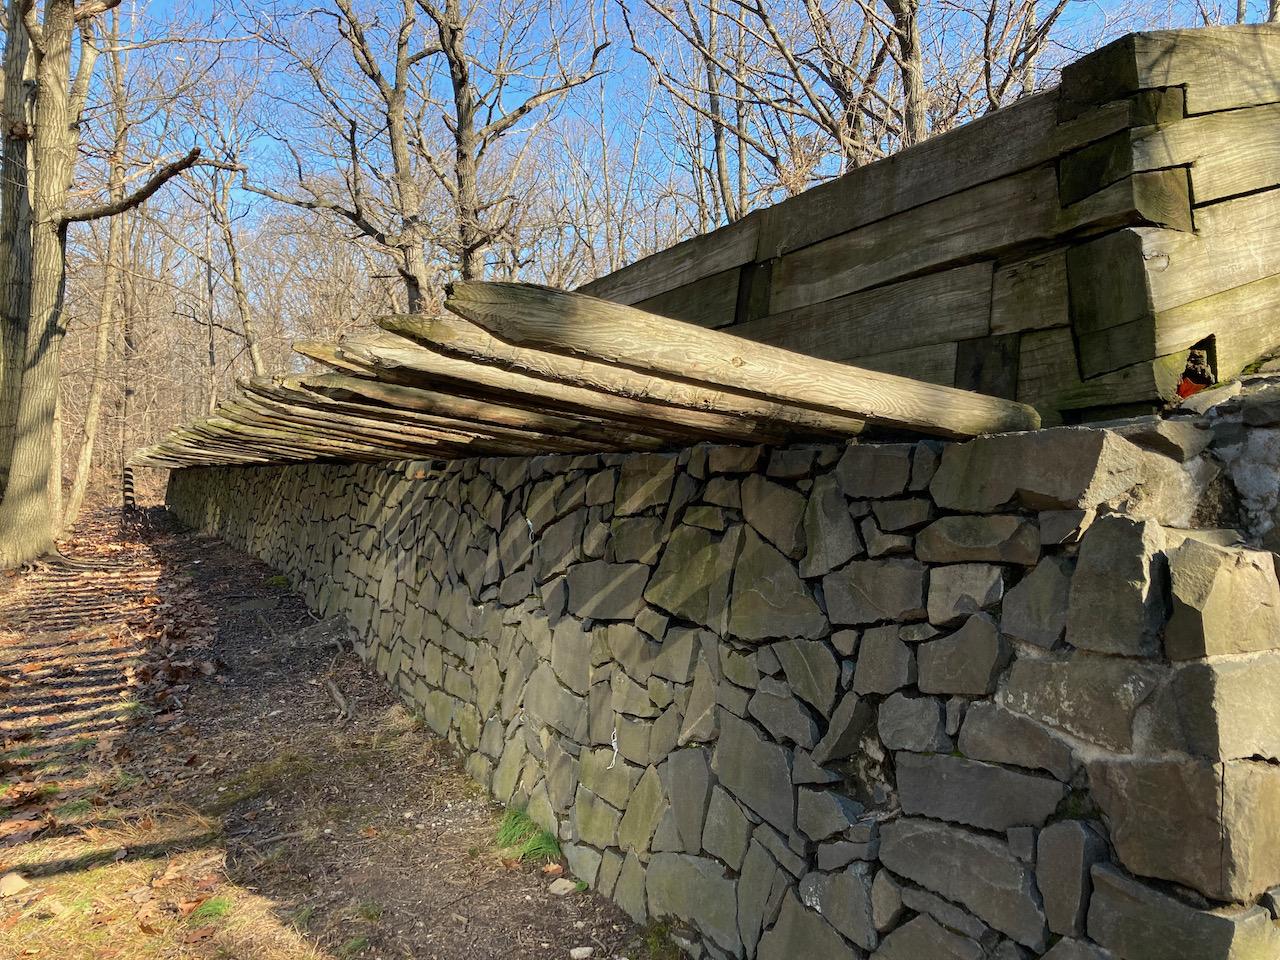 Earthenwork defensive fortification.